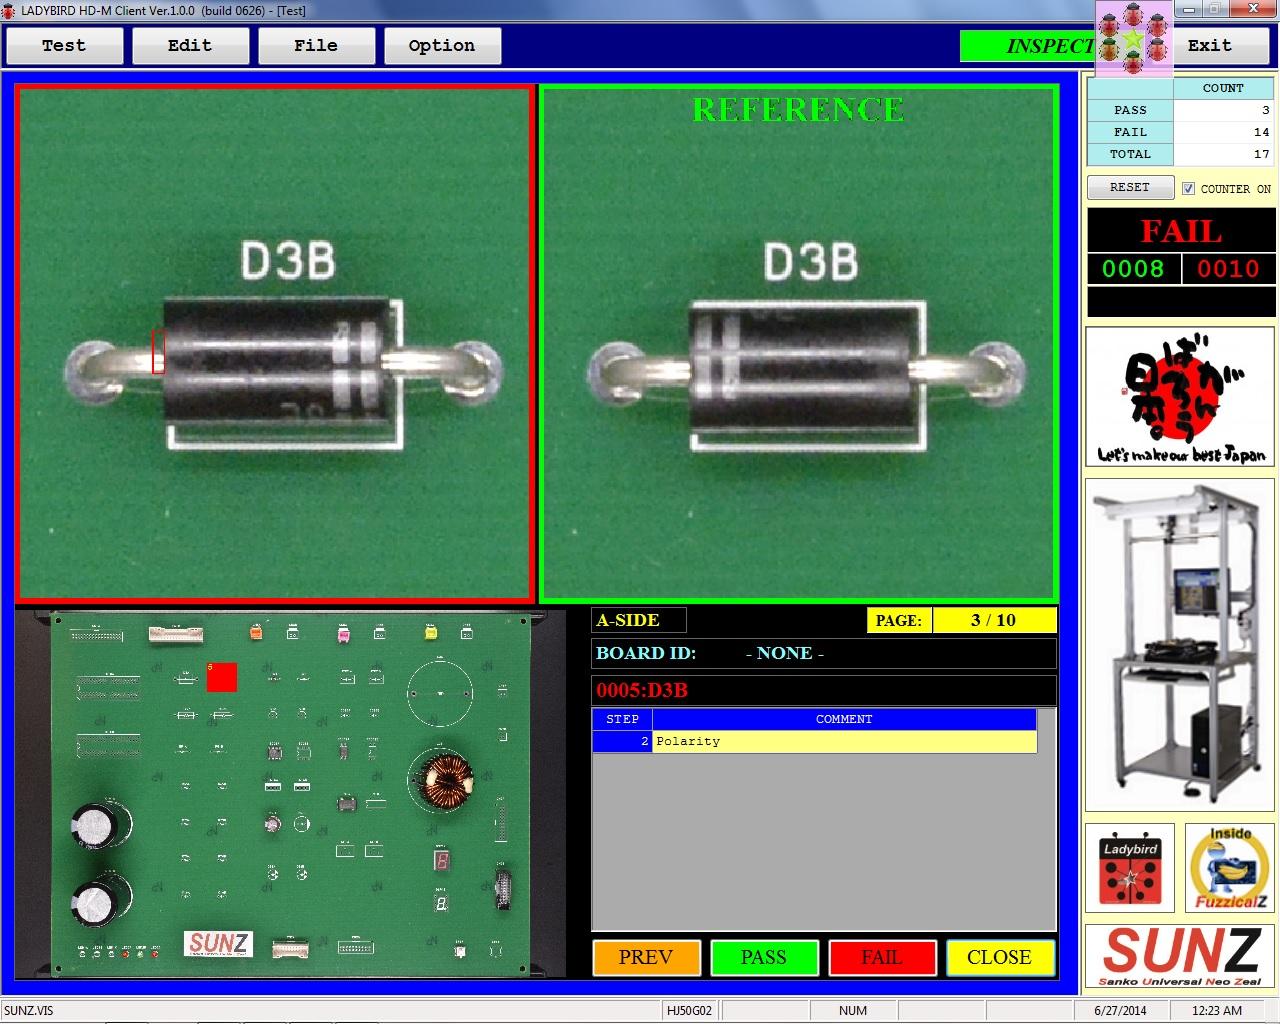 D3B (Polarity).jpg